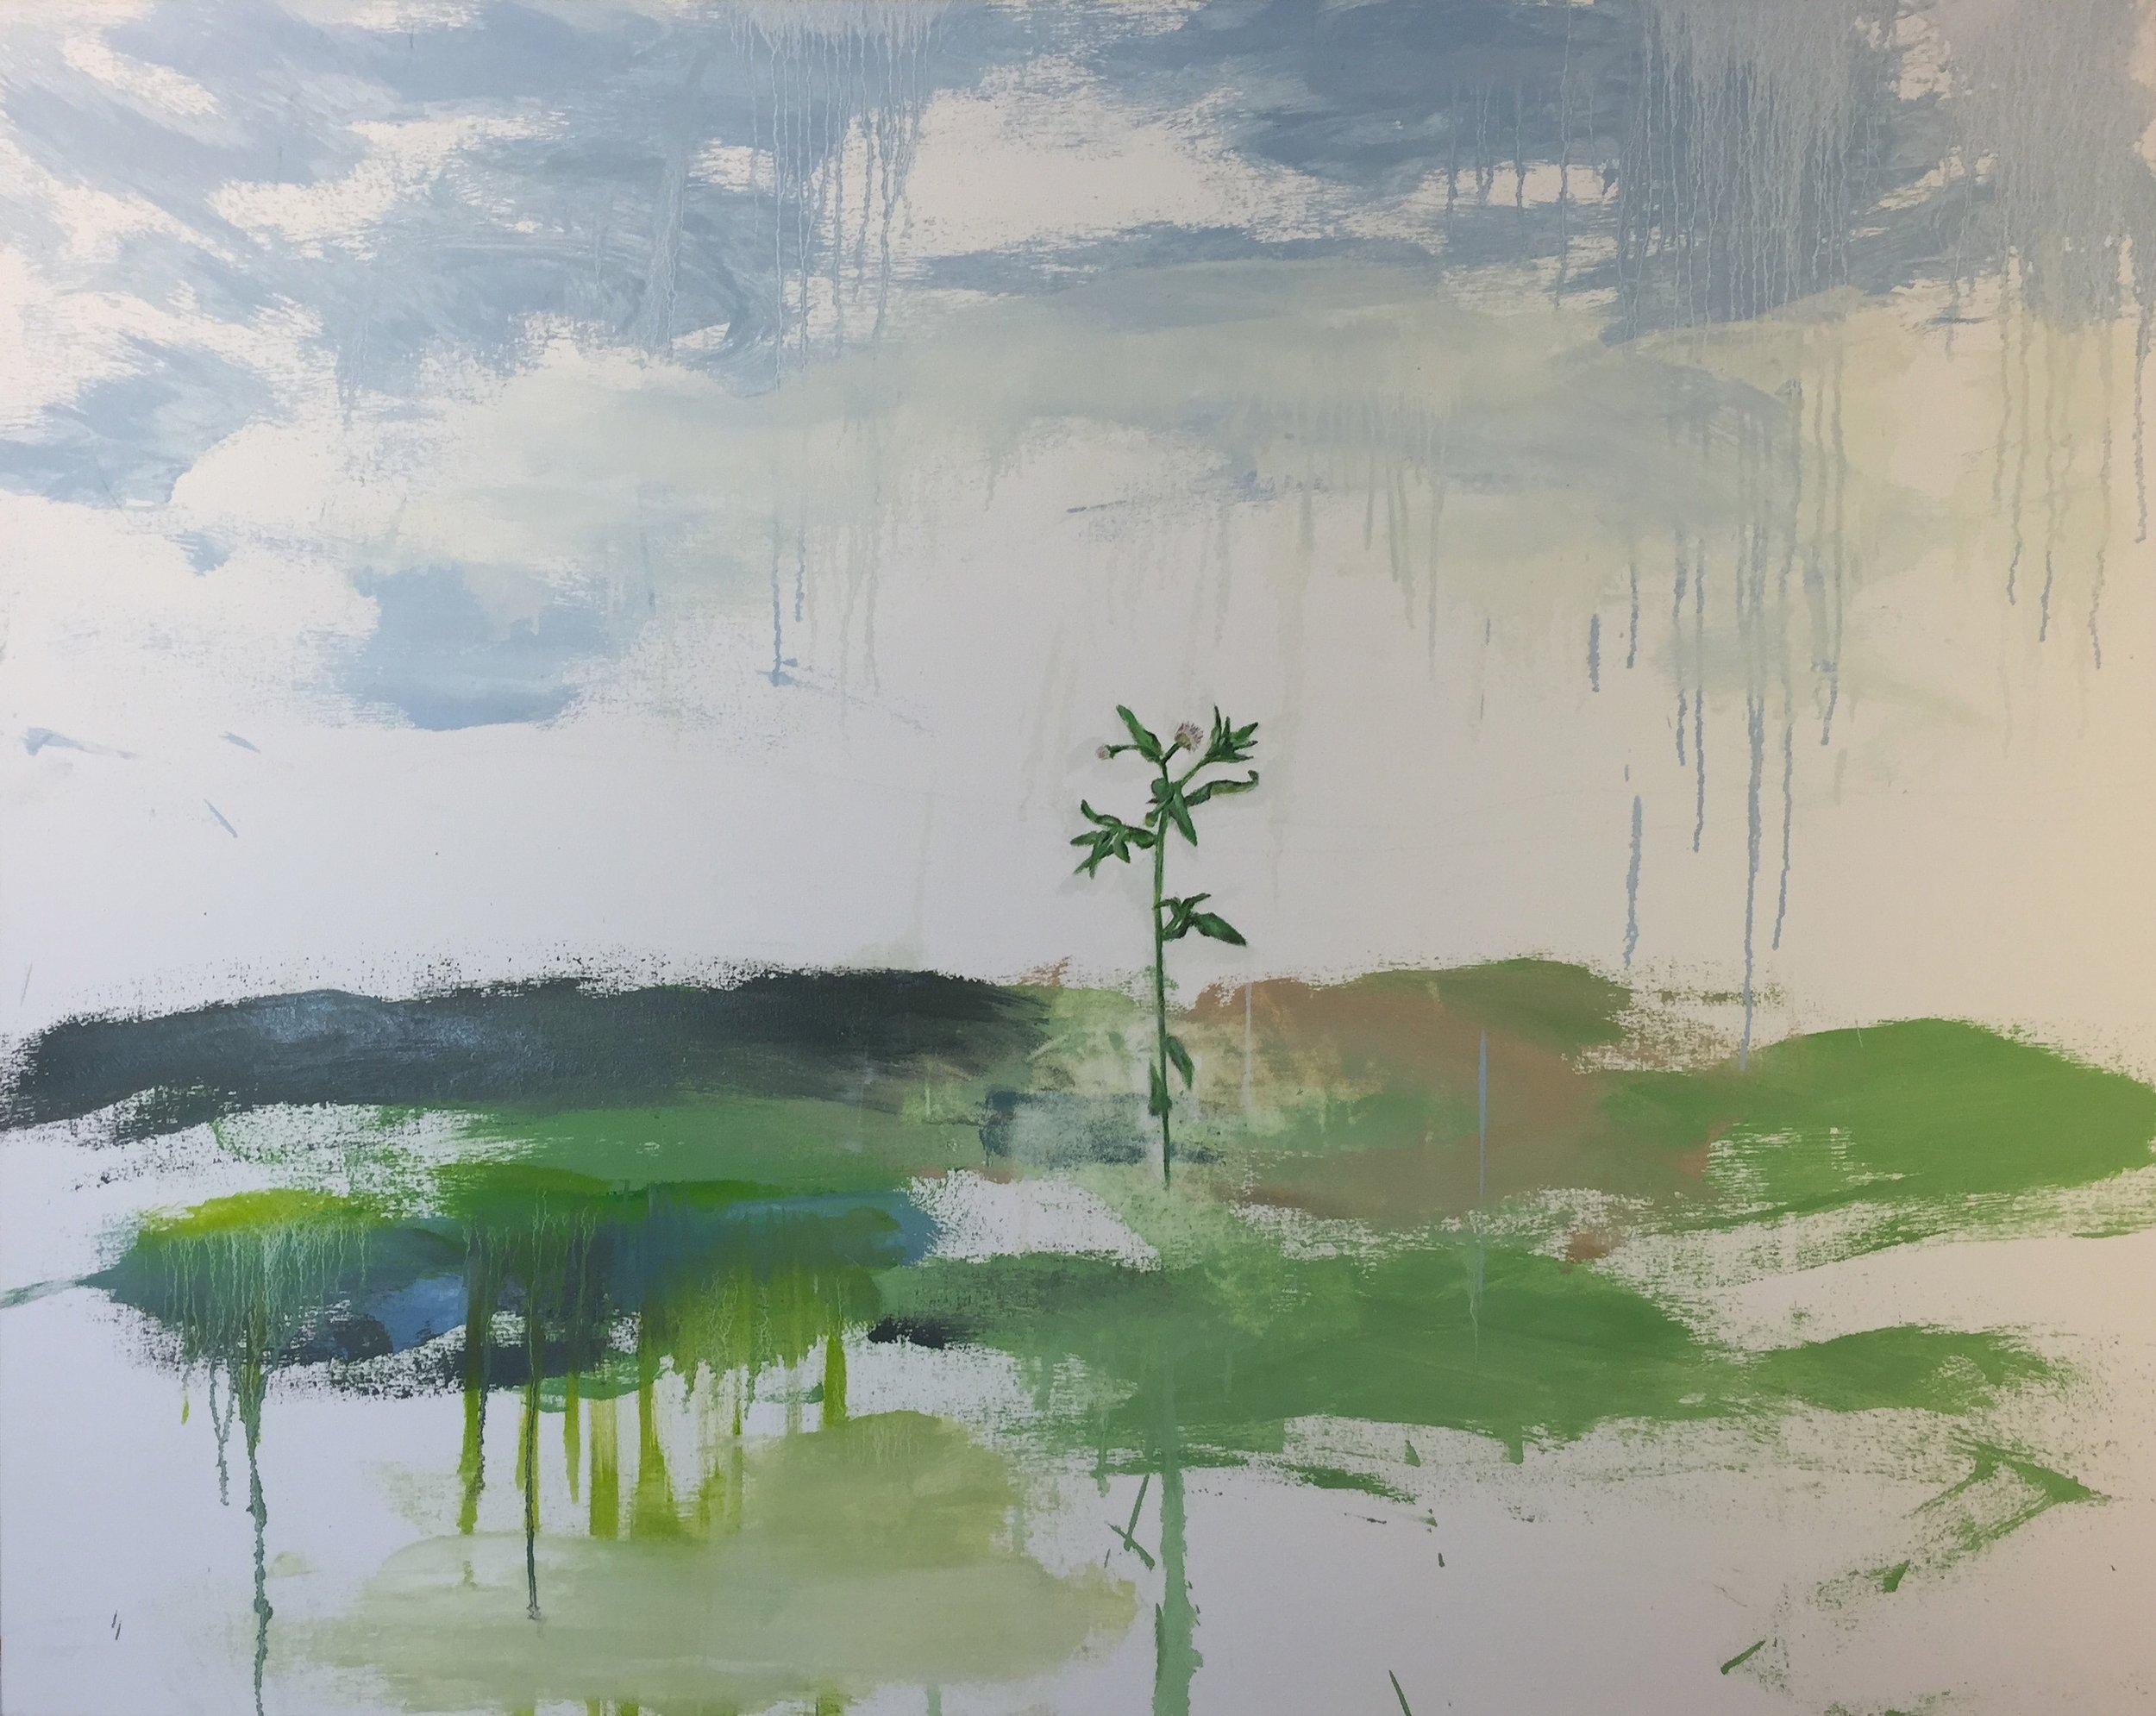 Imagined Landscape 2, 2009